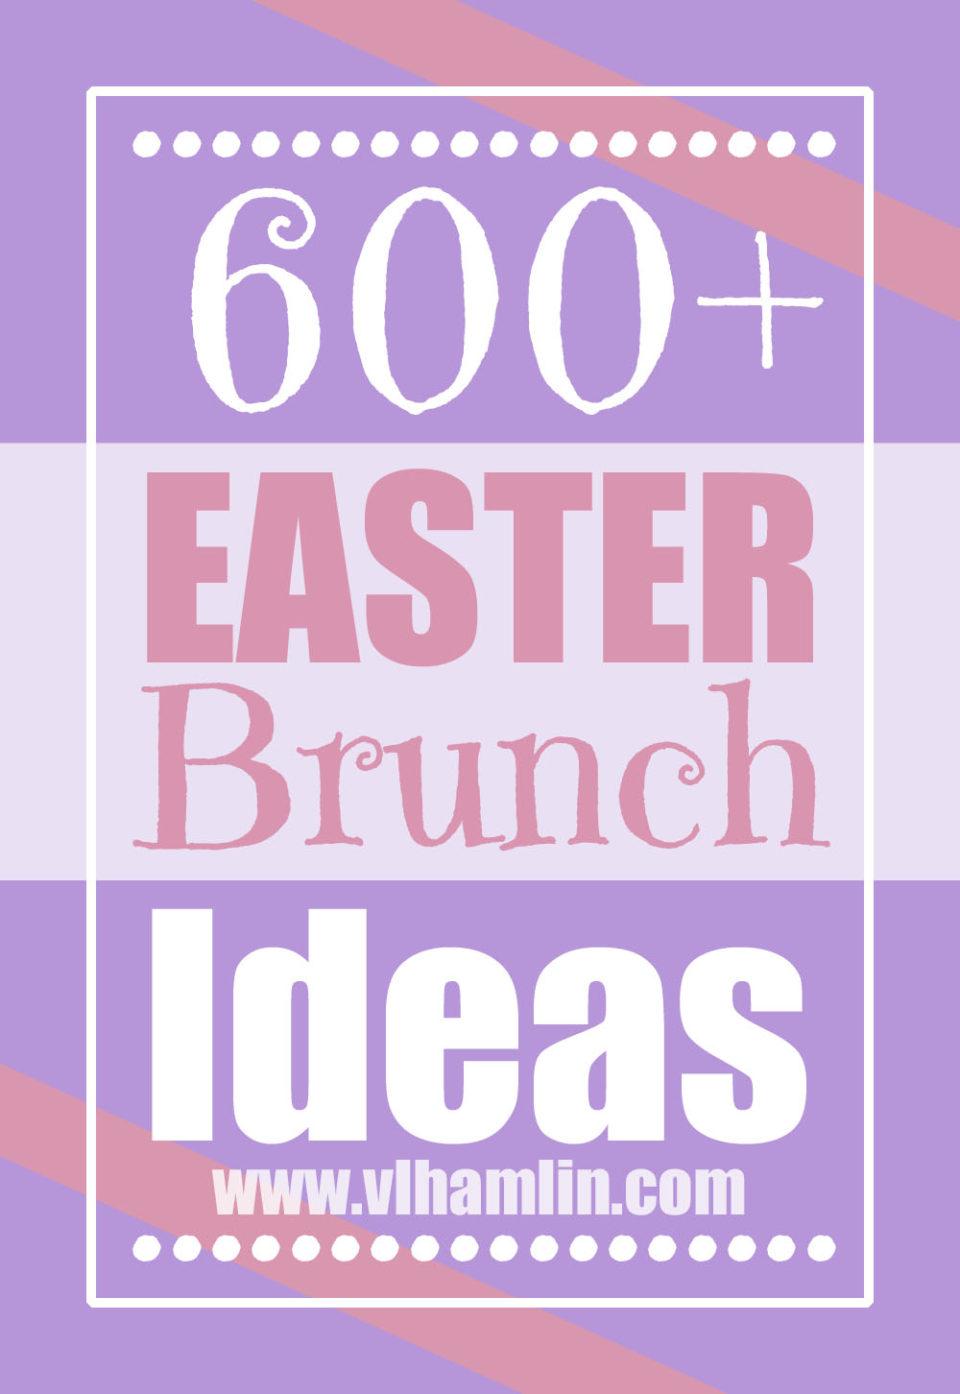 600+ Easter Brunch Ideas